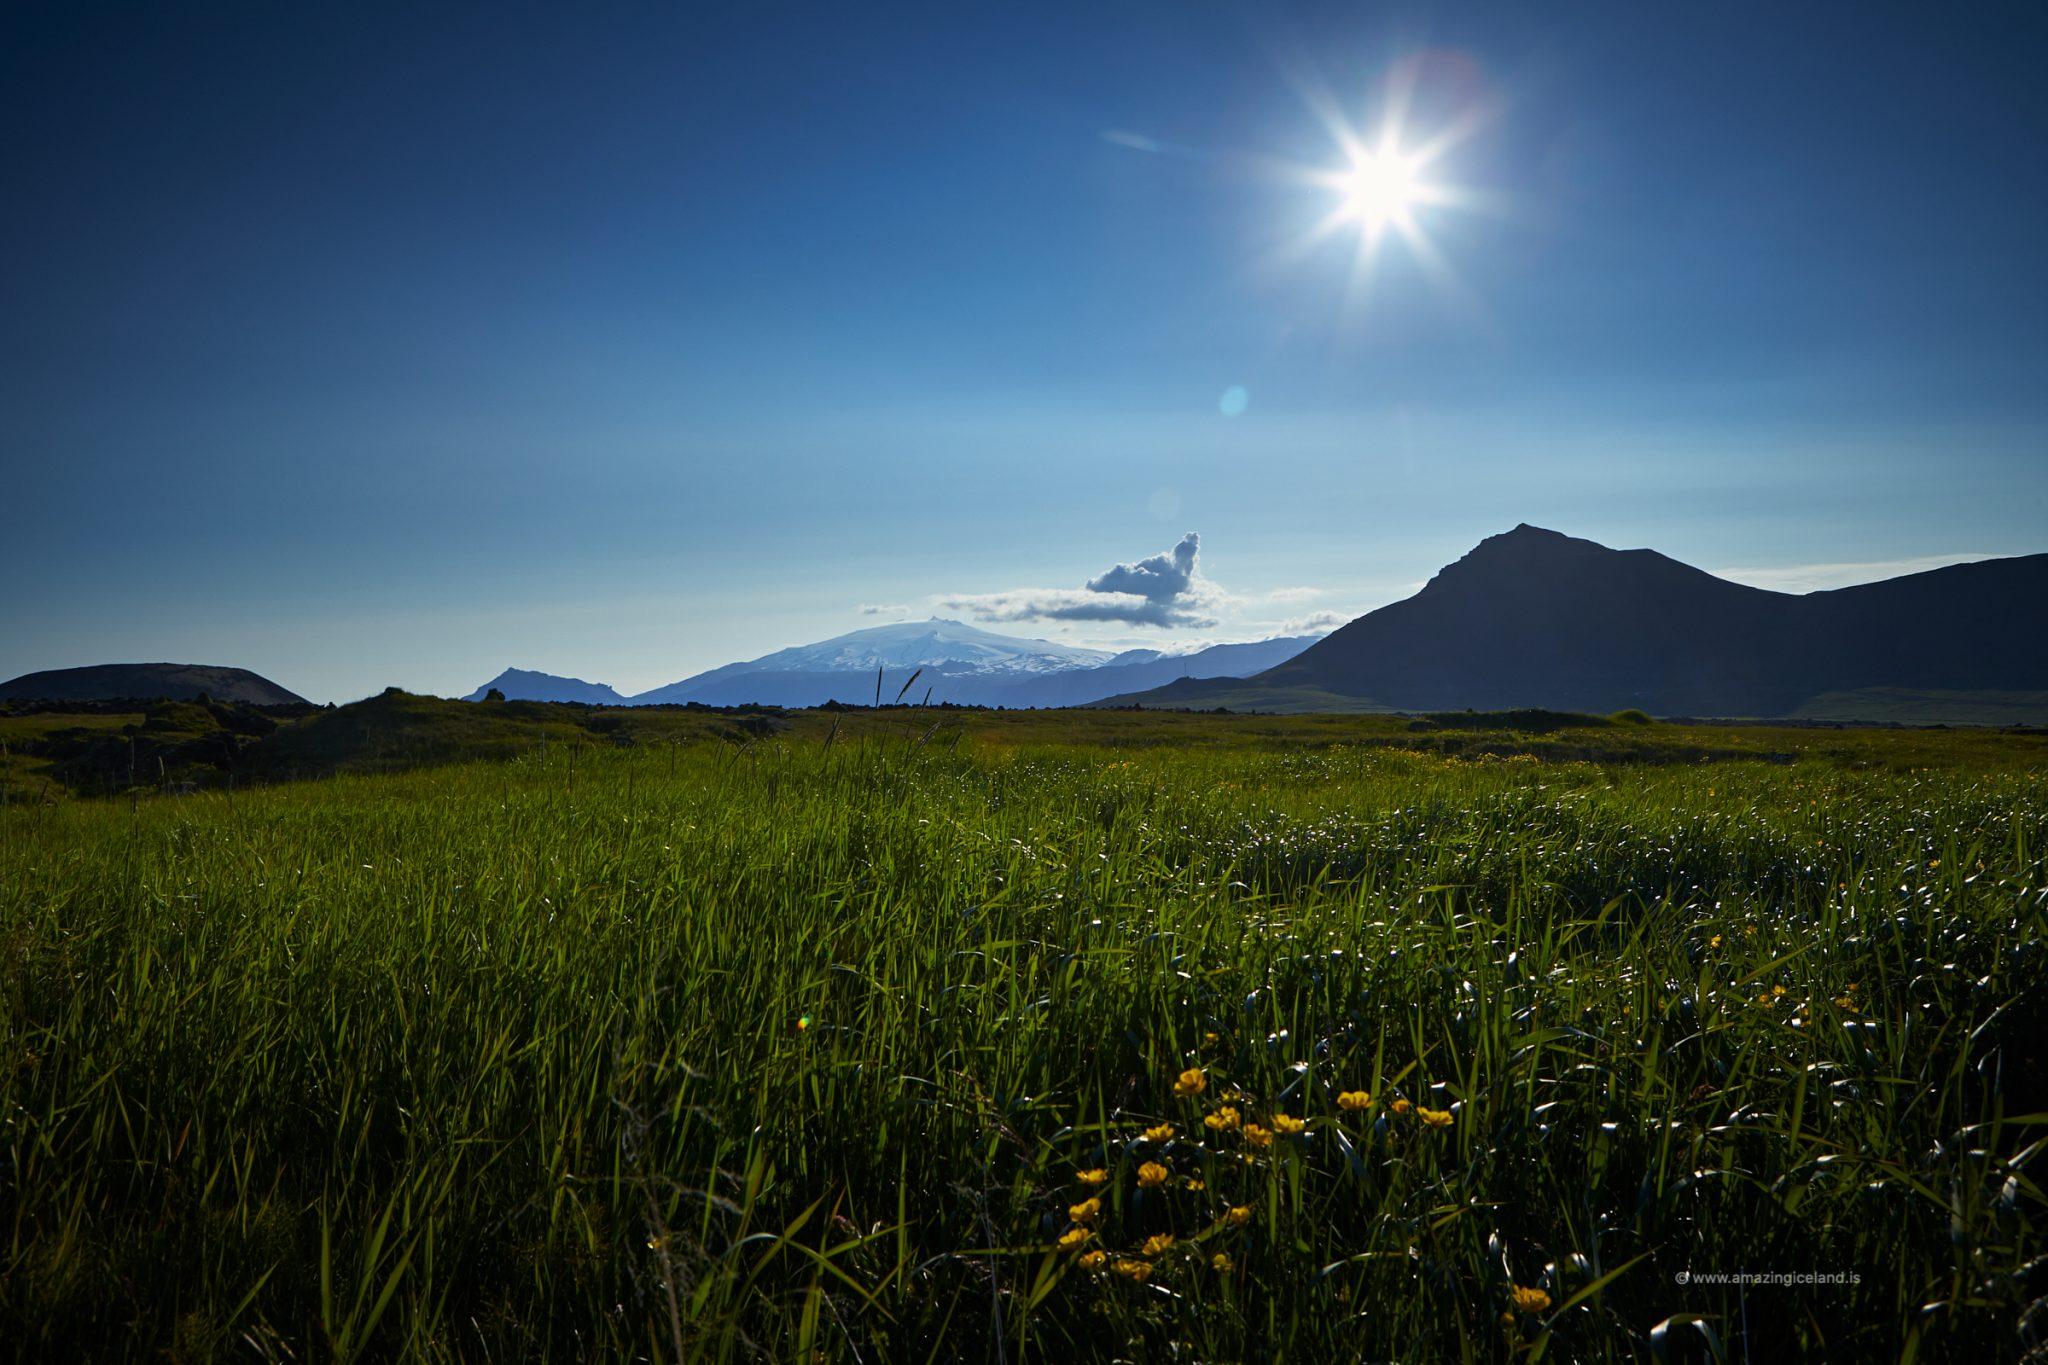 Snæfellsjökull glacier and Budir lava field in Snæfellsnes Iceland